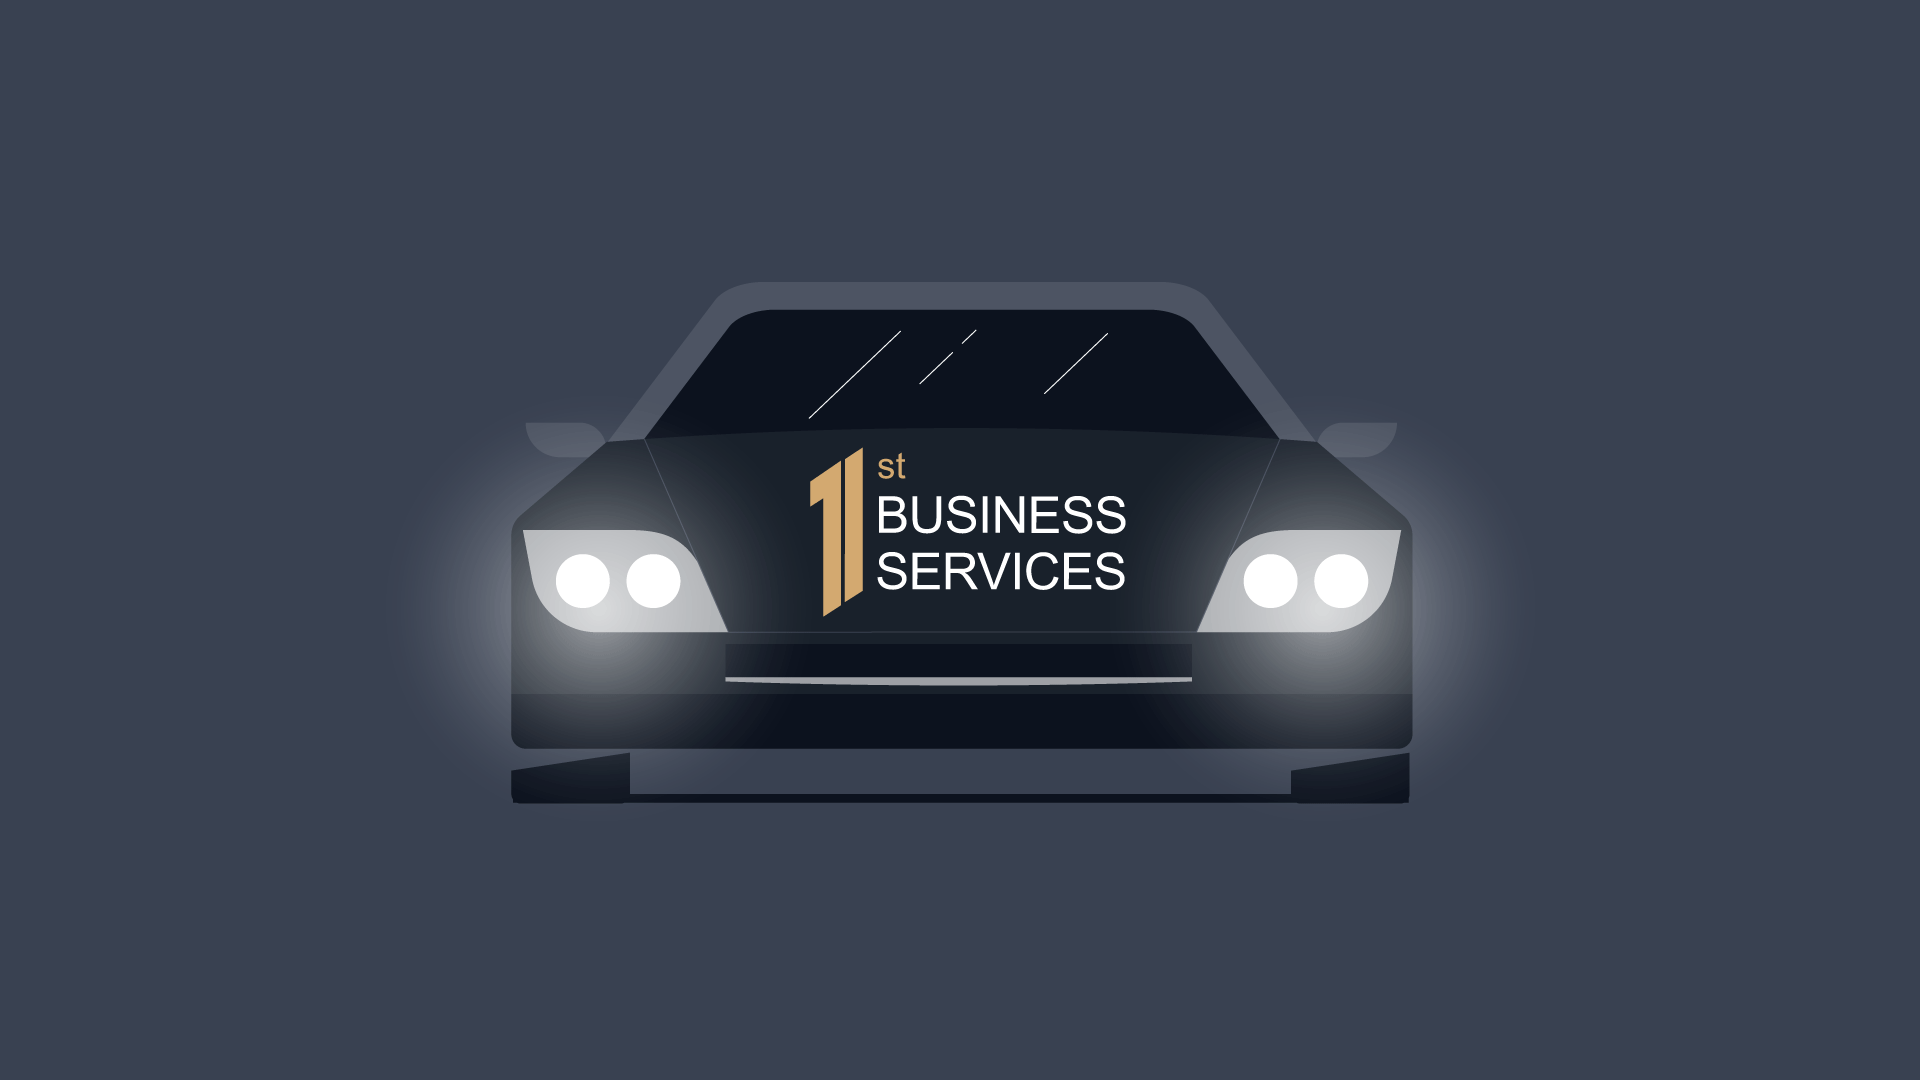 How Evrone developed an Uber-like, luxury transportation platform